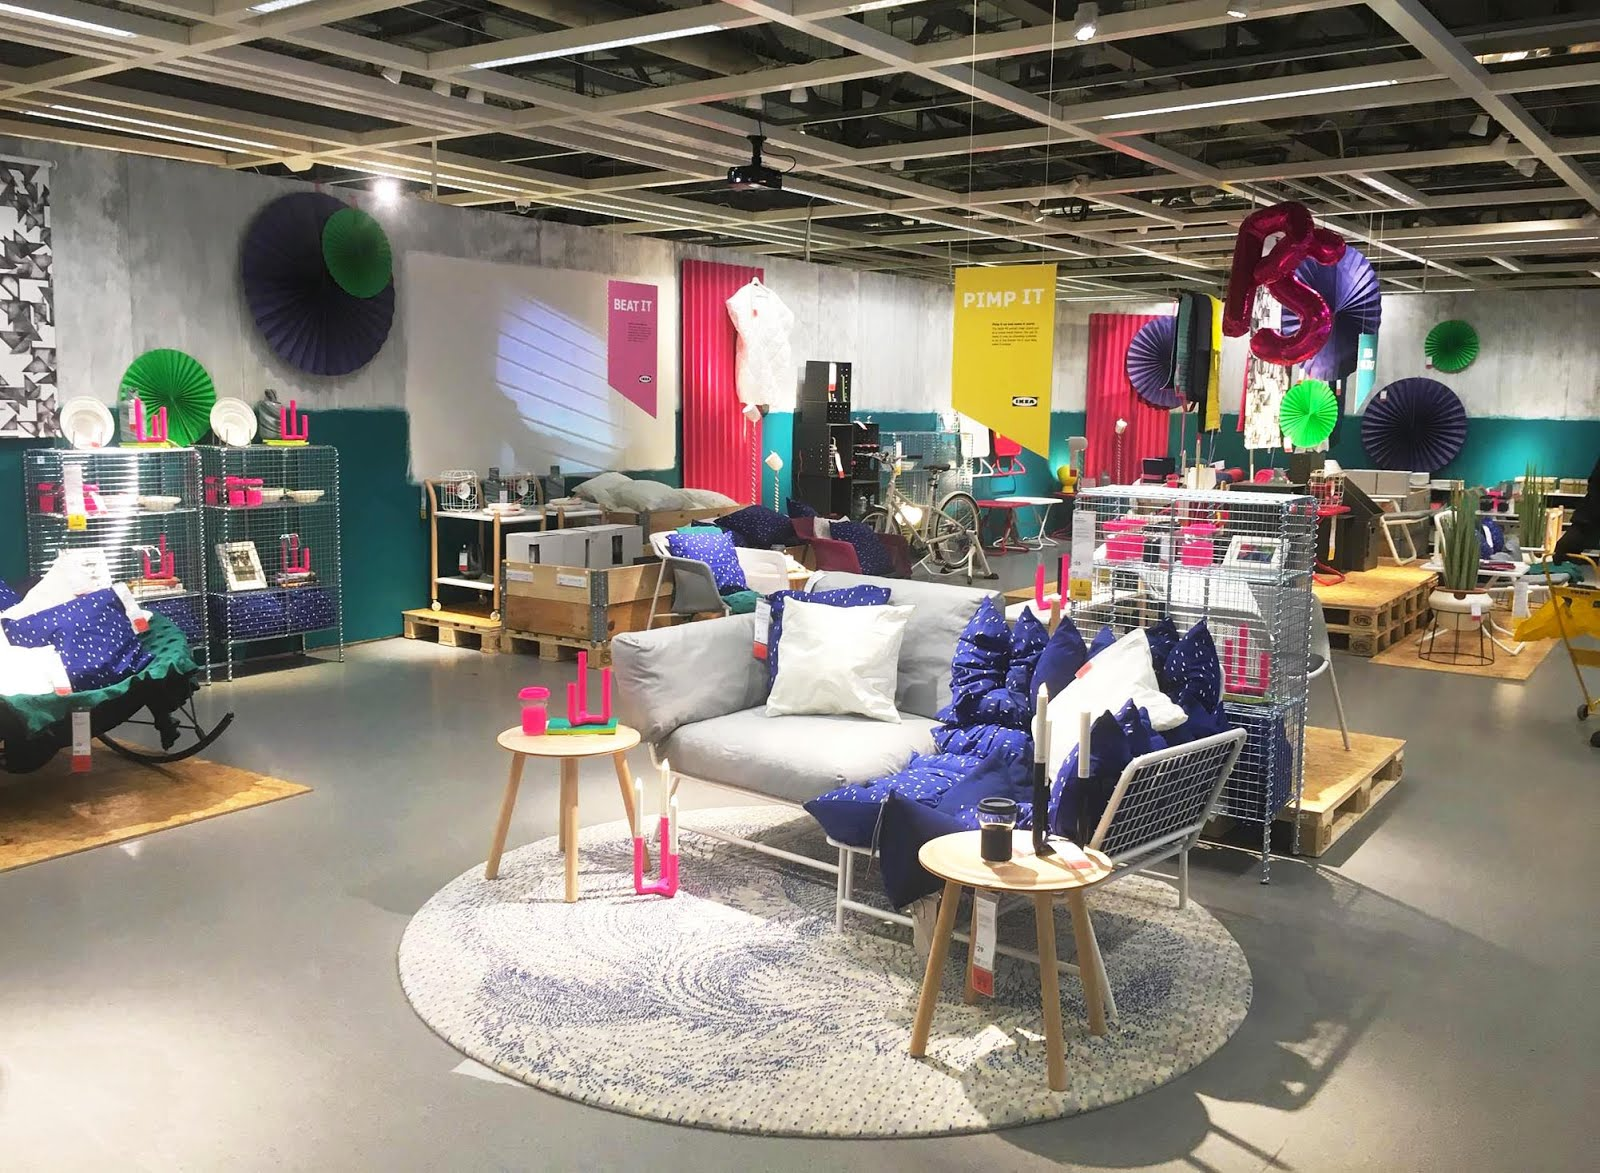 Ikea winning hearts and minds